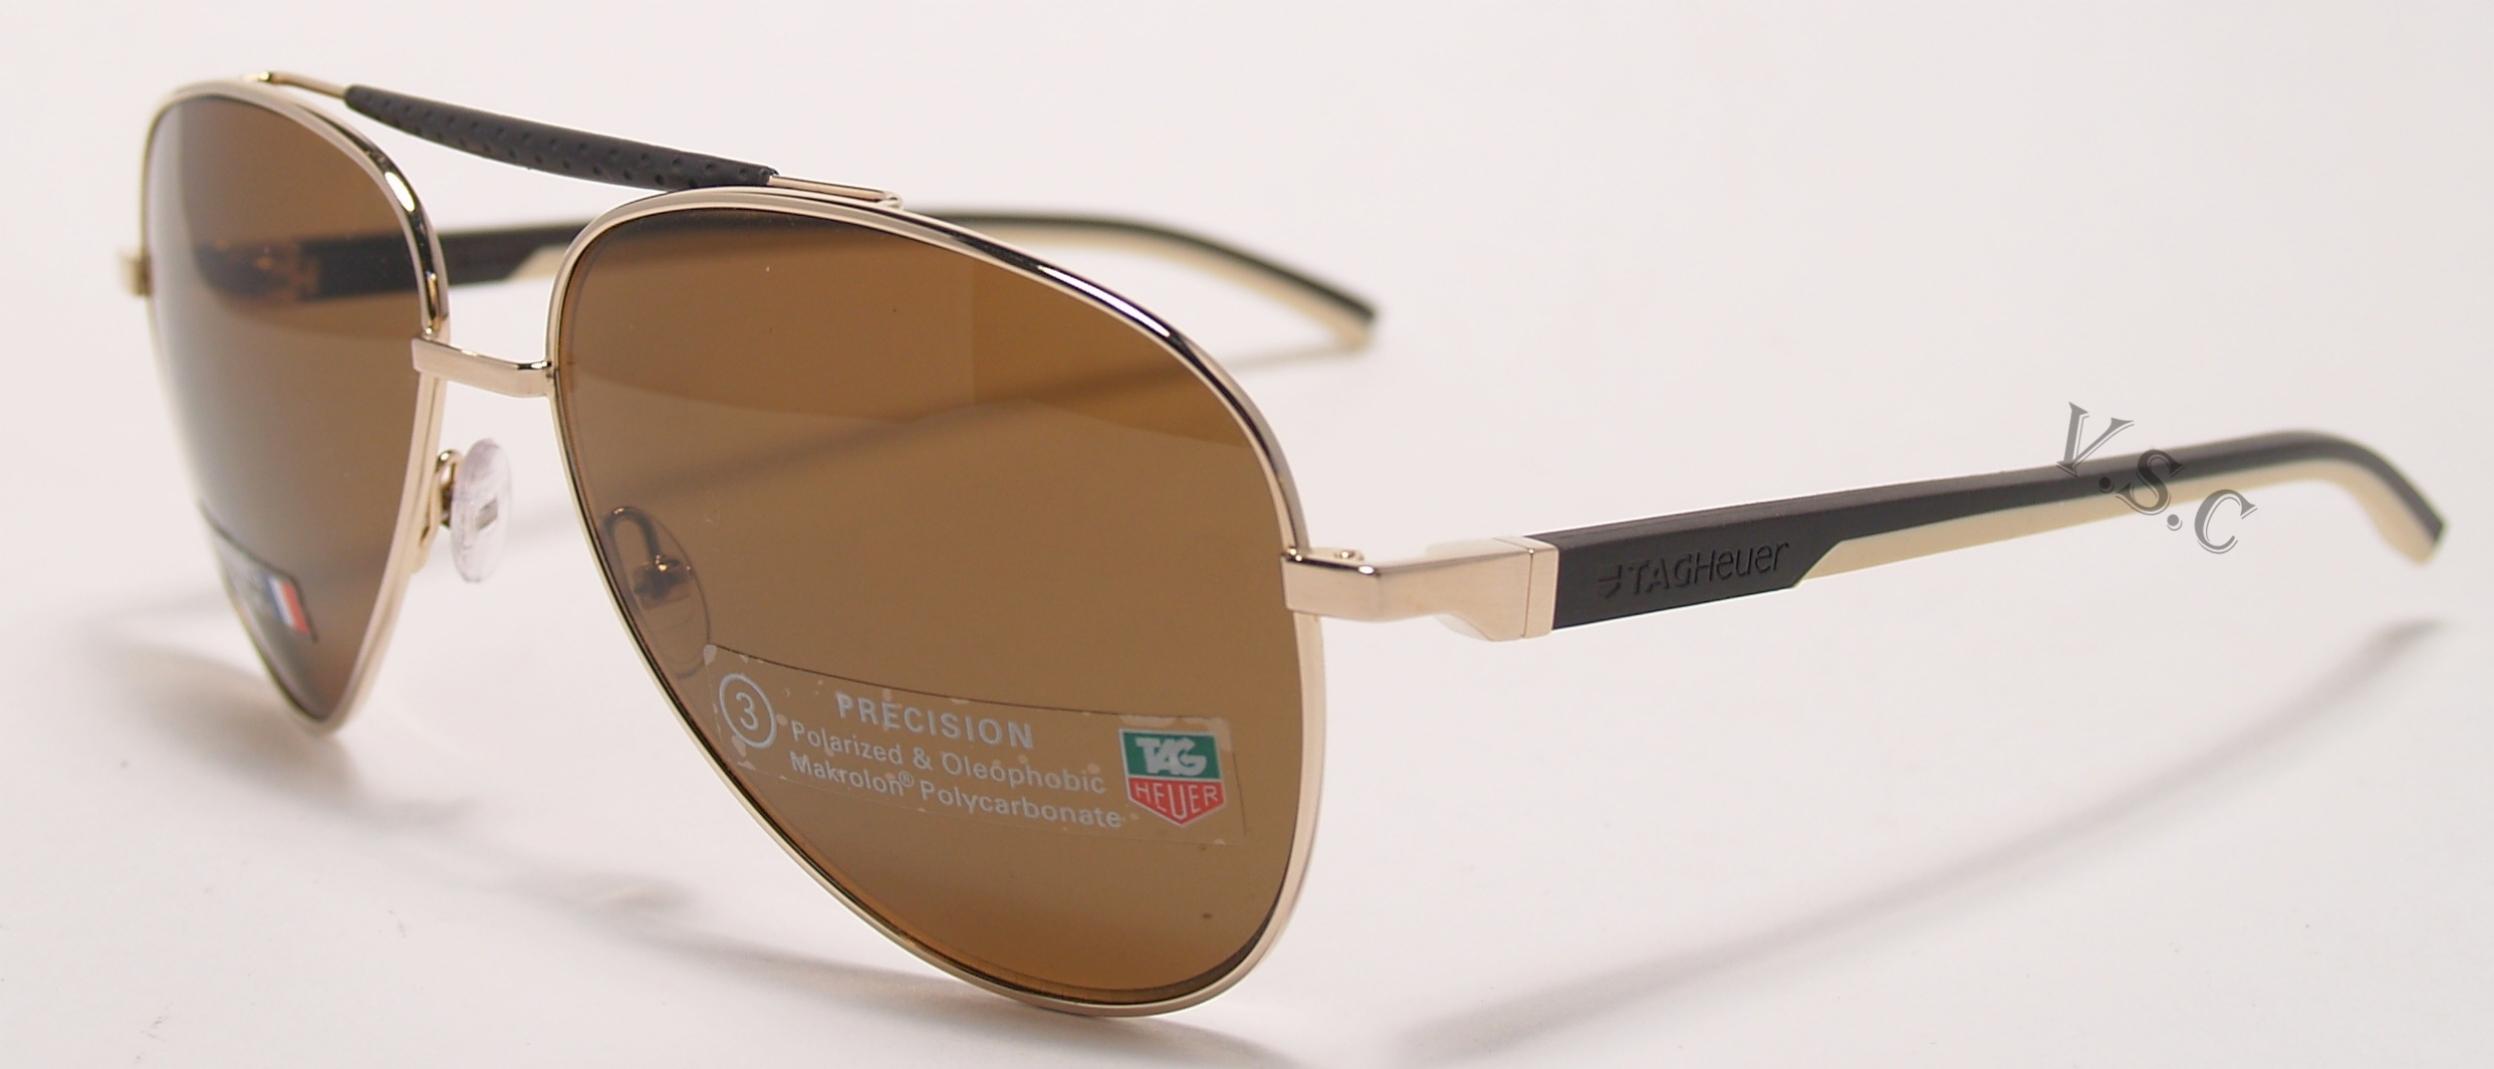 0f7518328370 Tag Heuer Sunglasses - Luxury Designerware Sunglasses